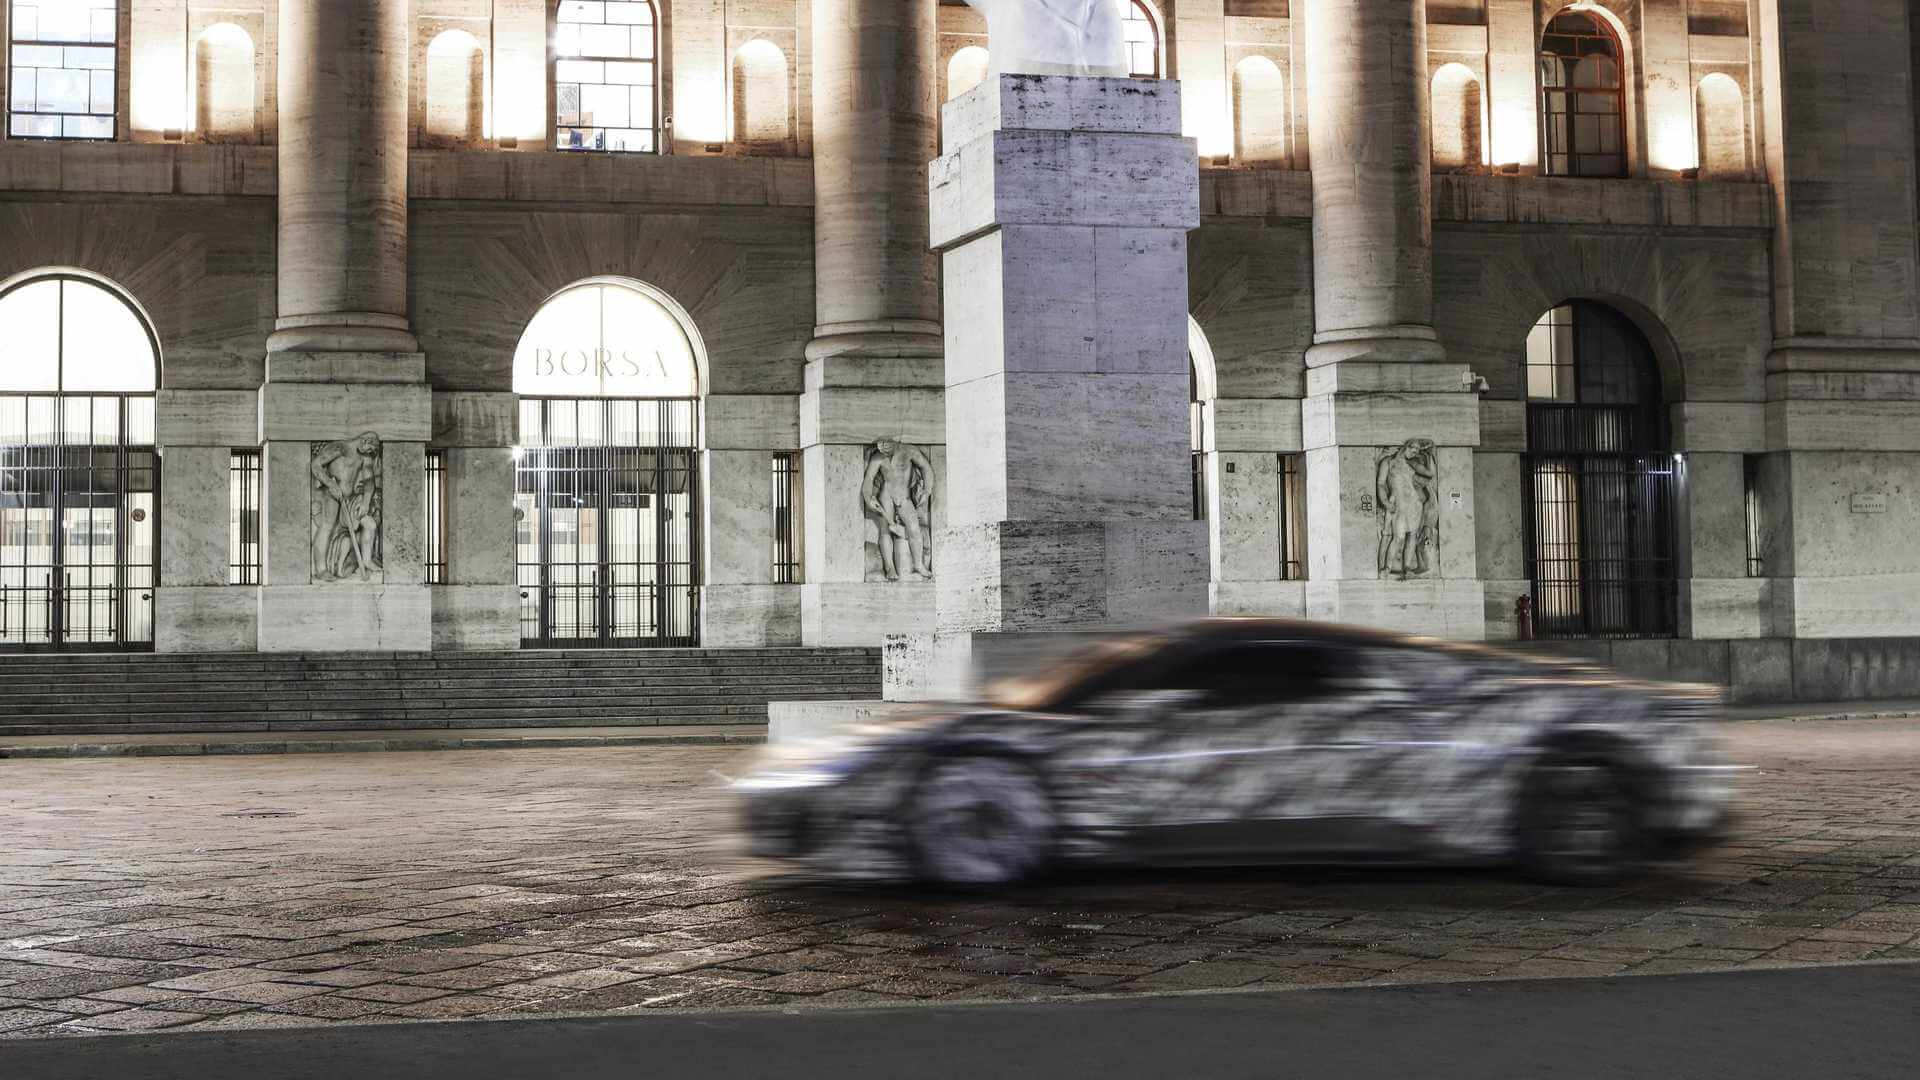 Прототип будущего спортивного автомобиля Maserati MC20